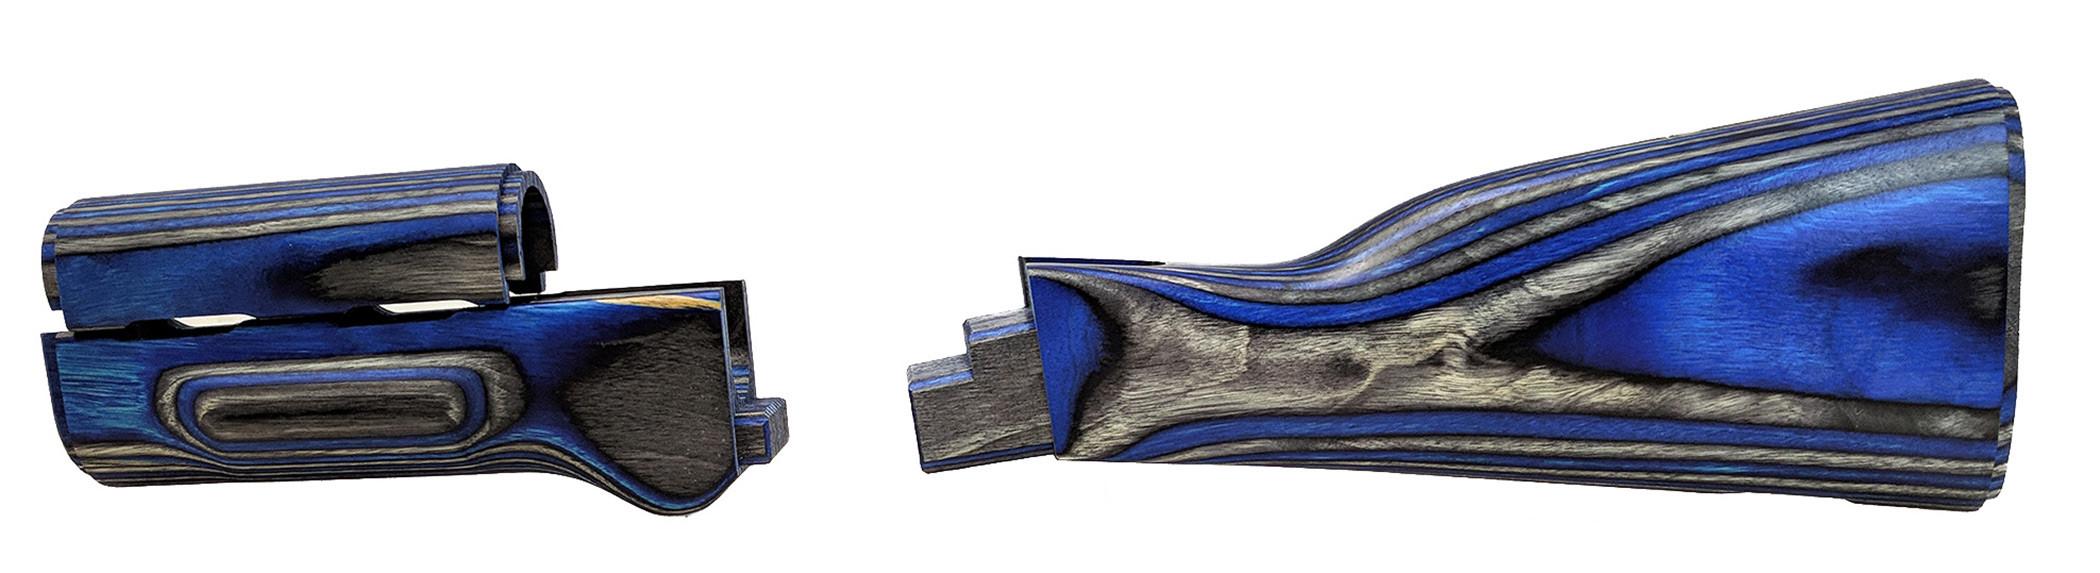 AK Laminated Furniture Set, Blue, w/o Grip, *NEW*